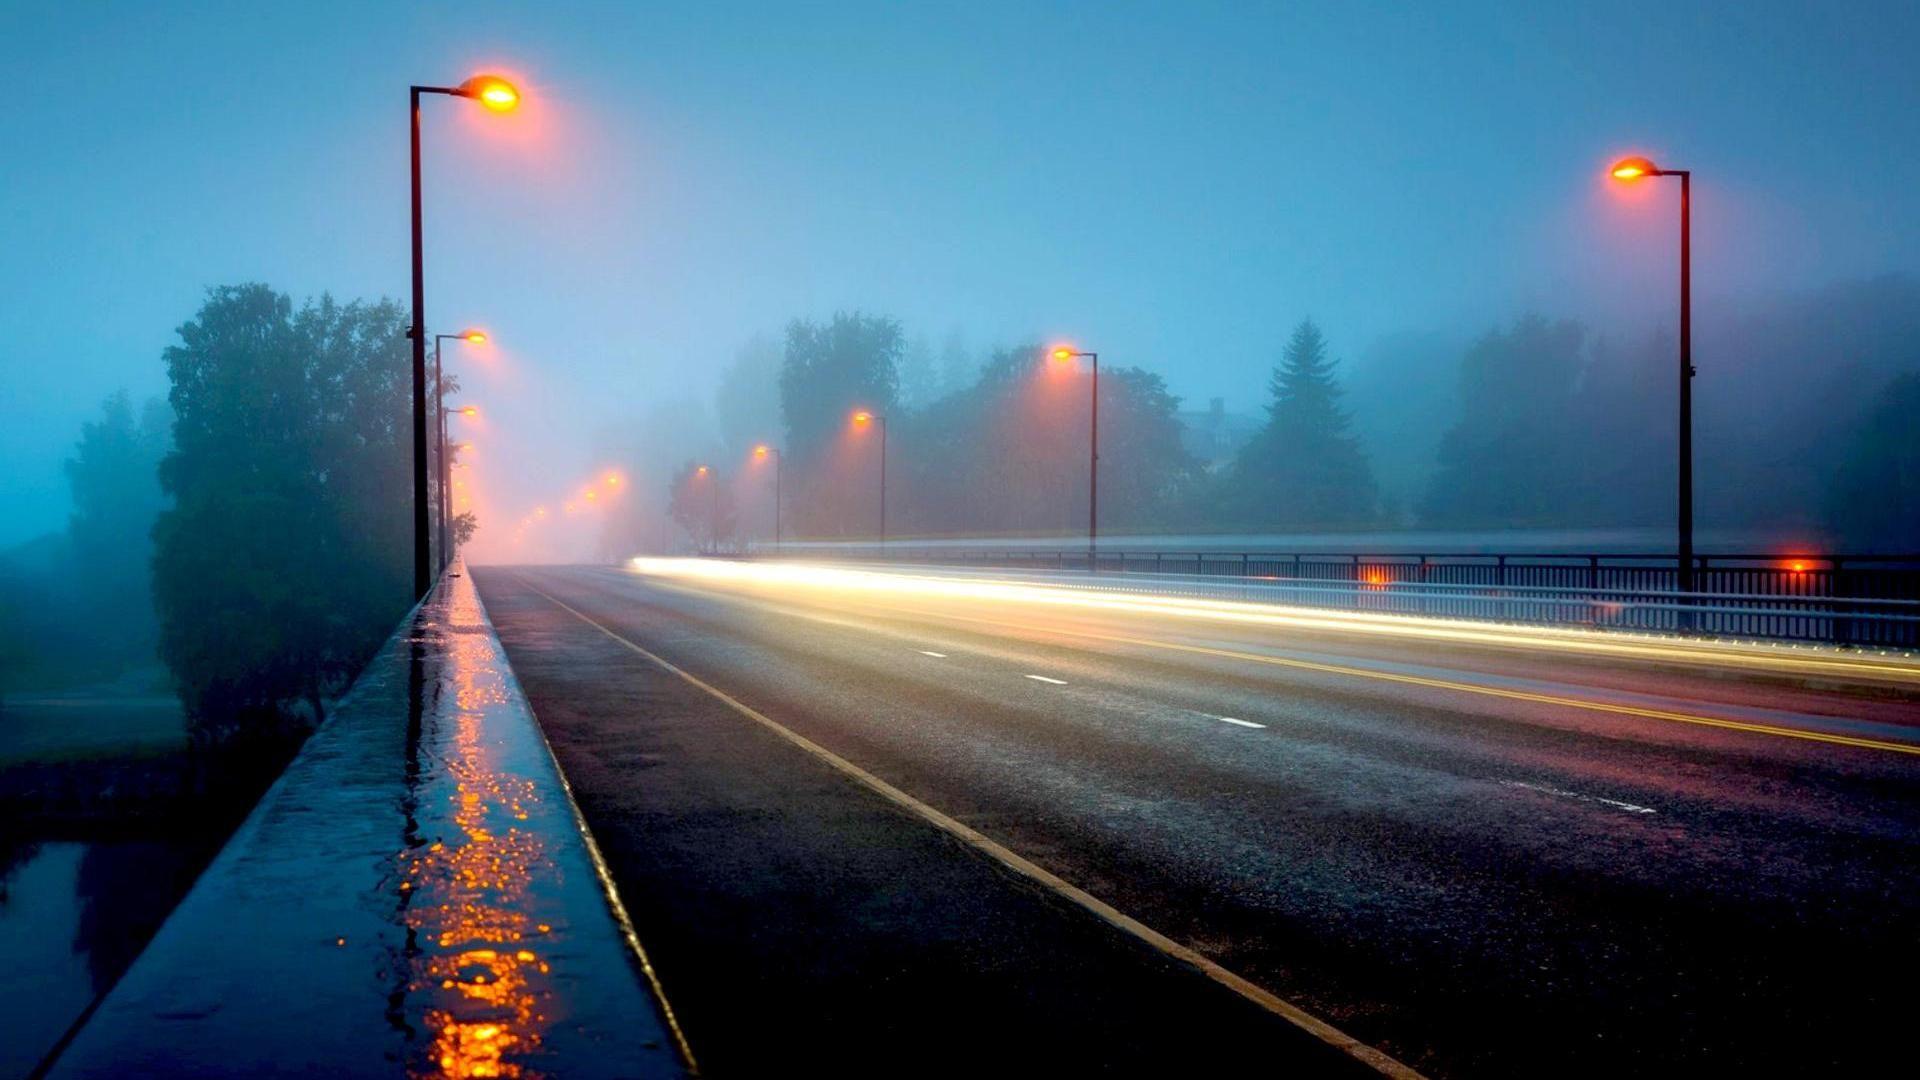 A Highway Bridge In Foggy Rainy Night HD Desktop Background Wallpaper Free